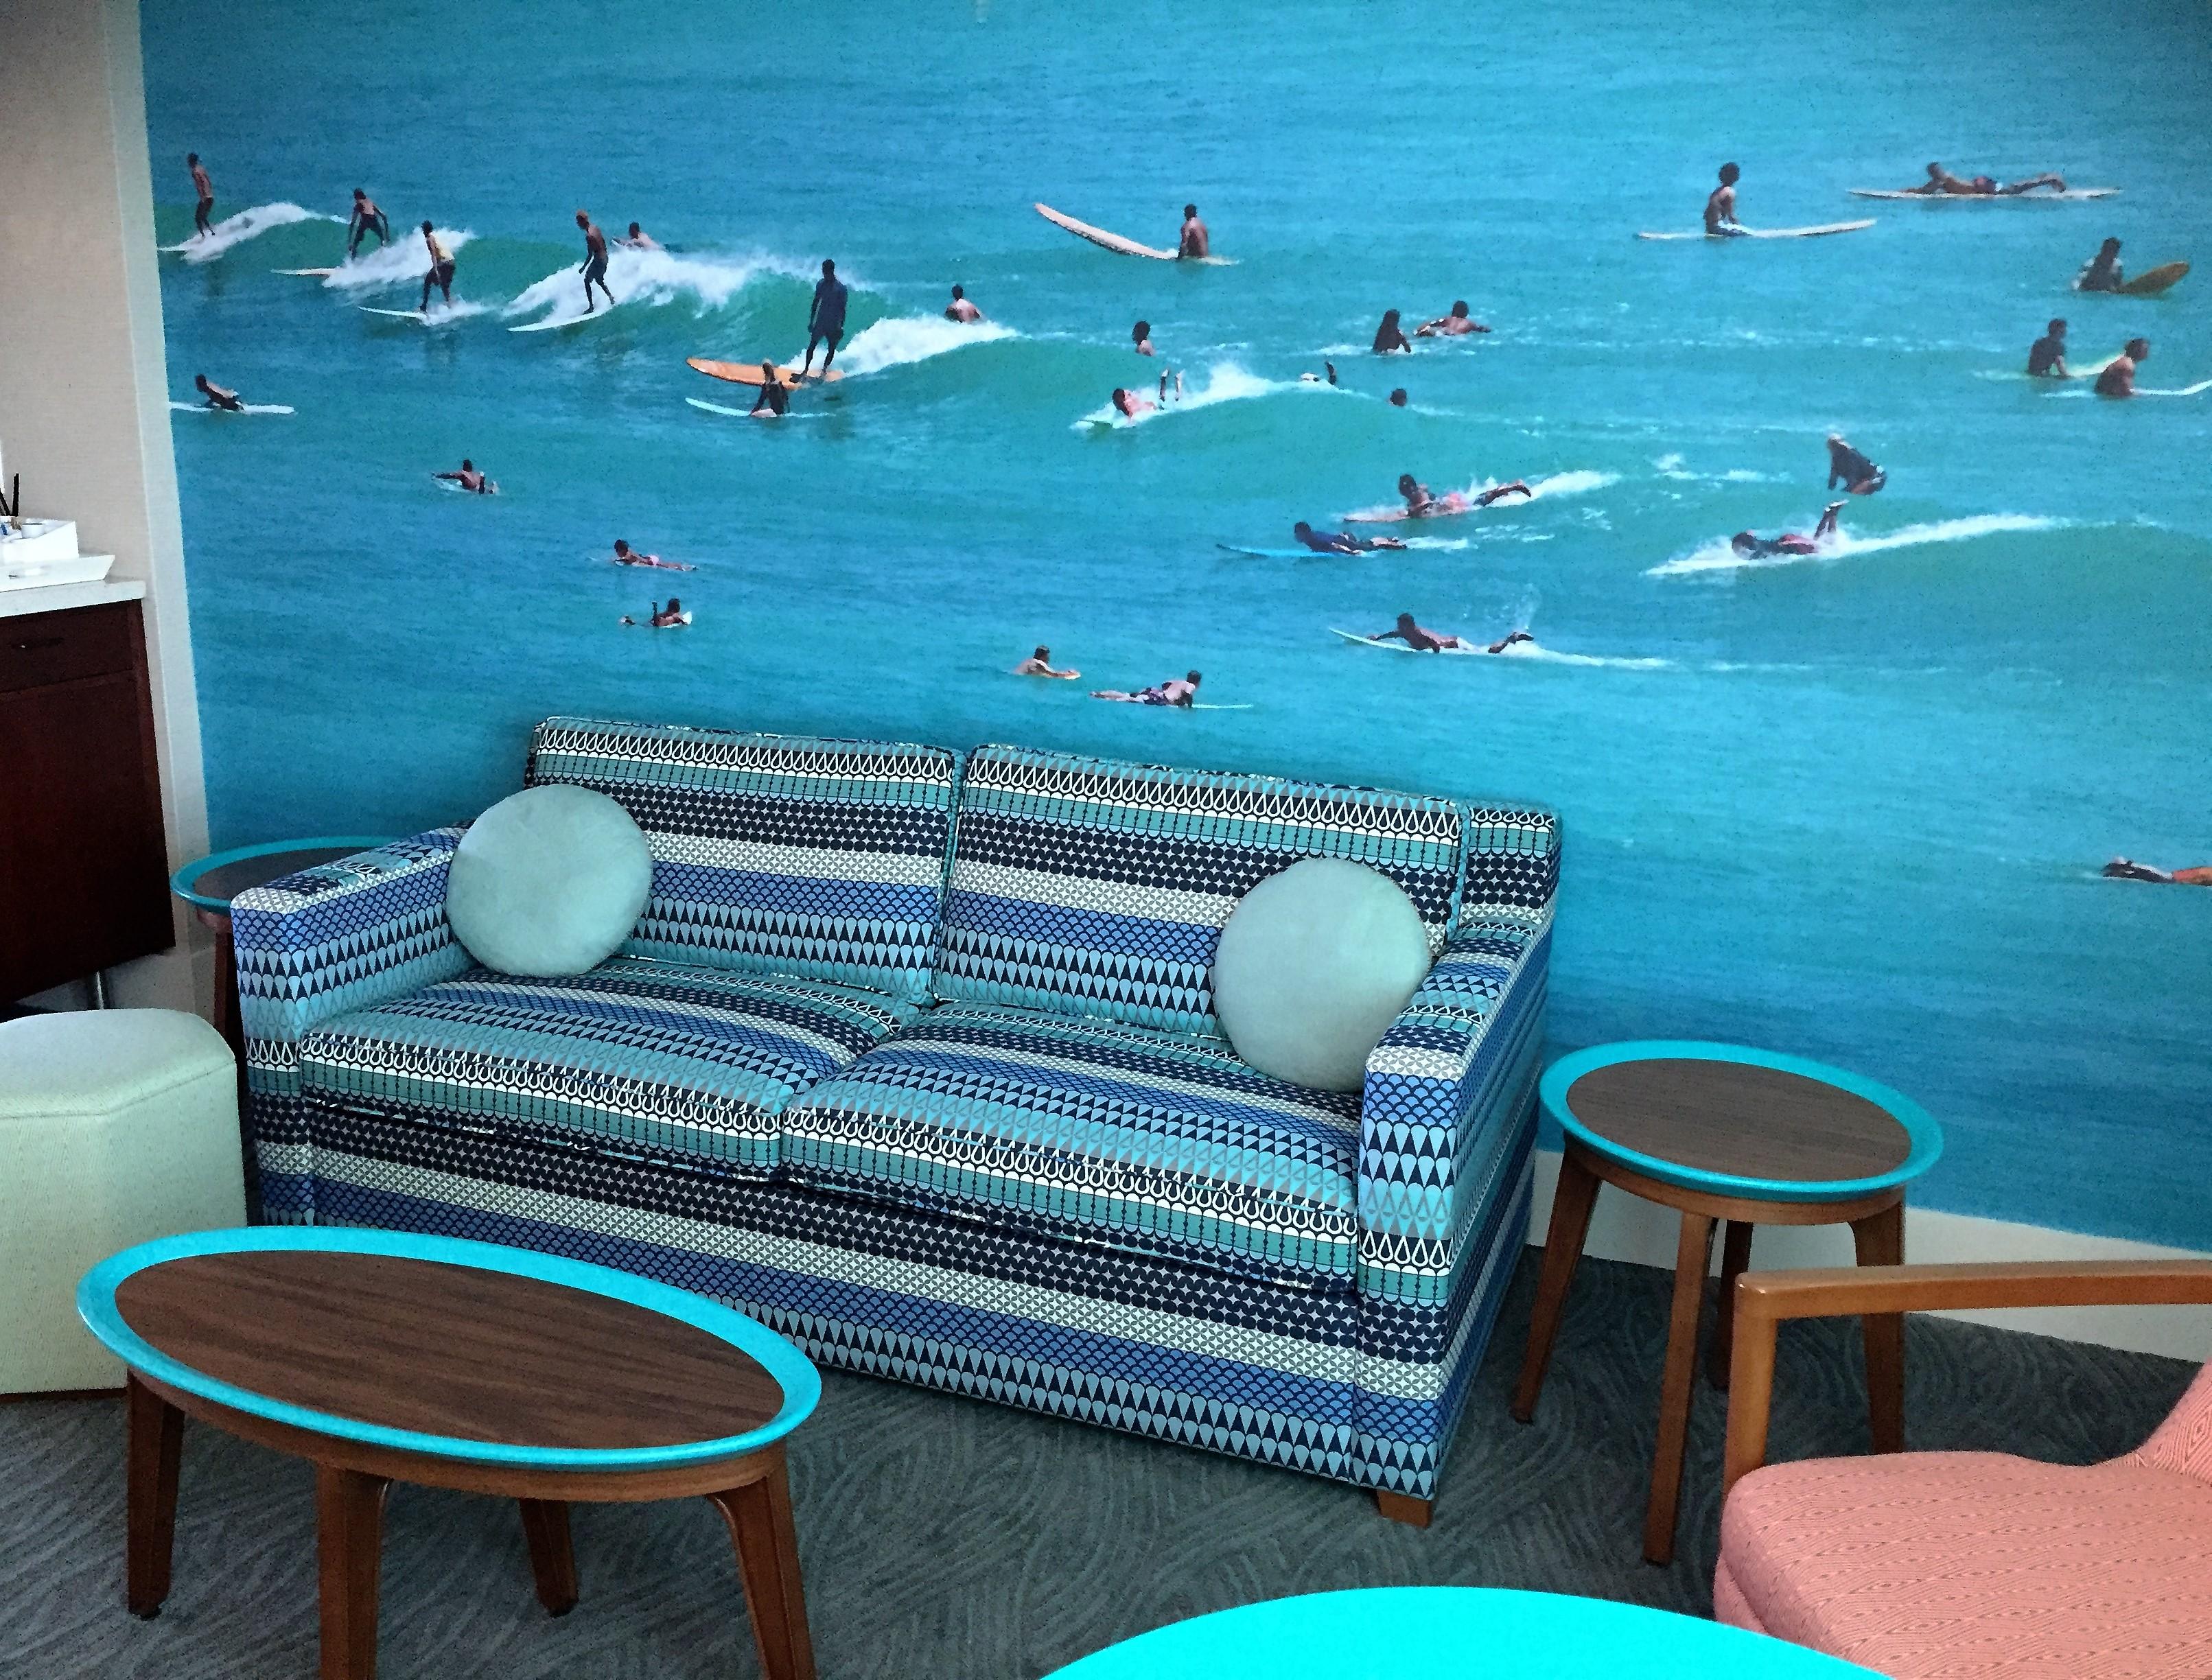 Santa Cruz Style 3 Hotels To Inspire